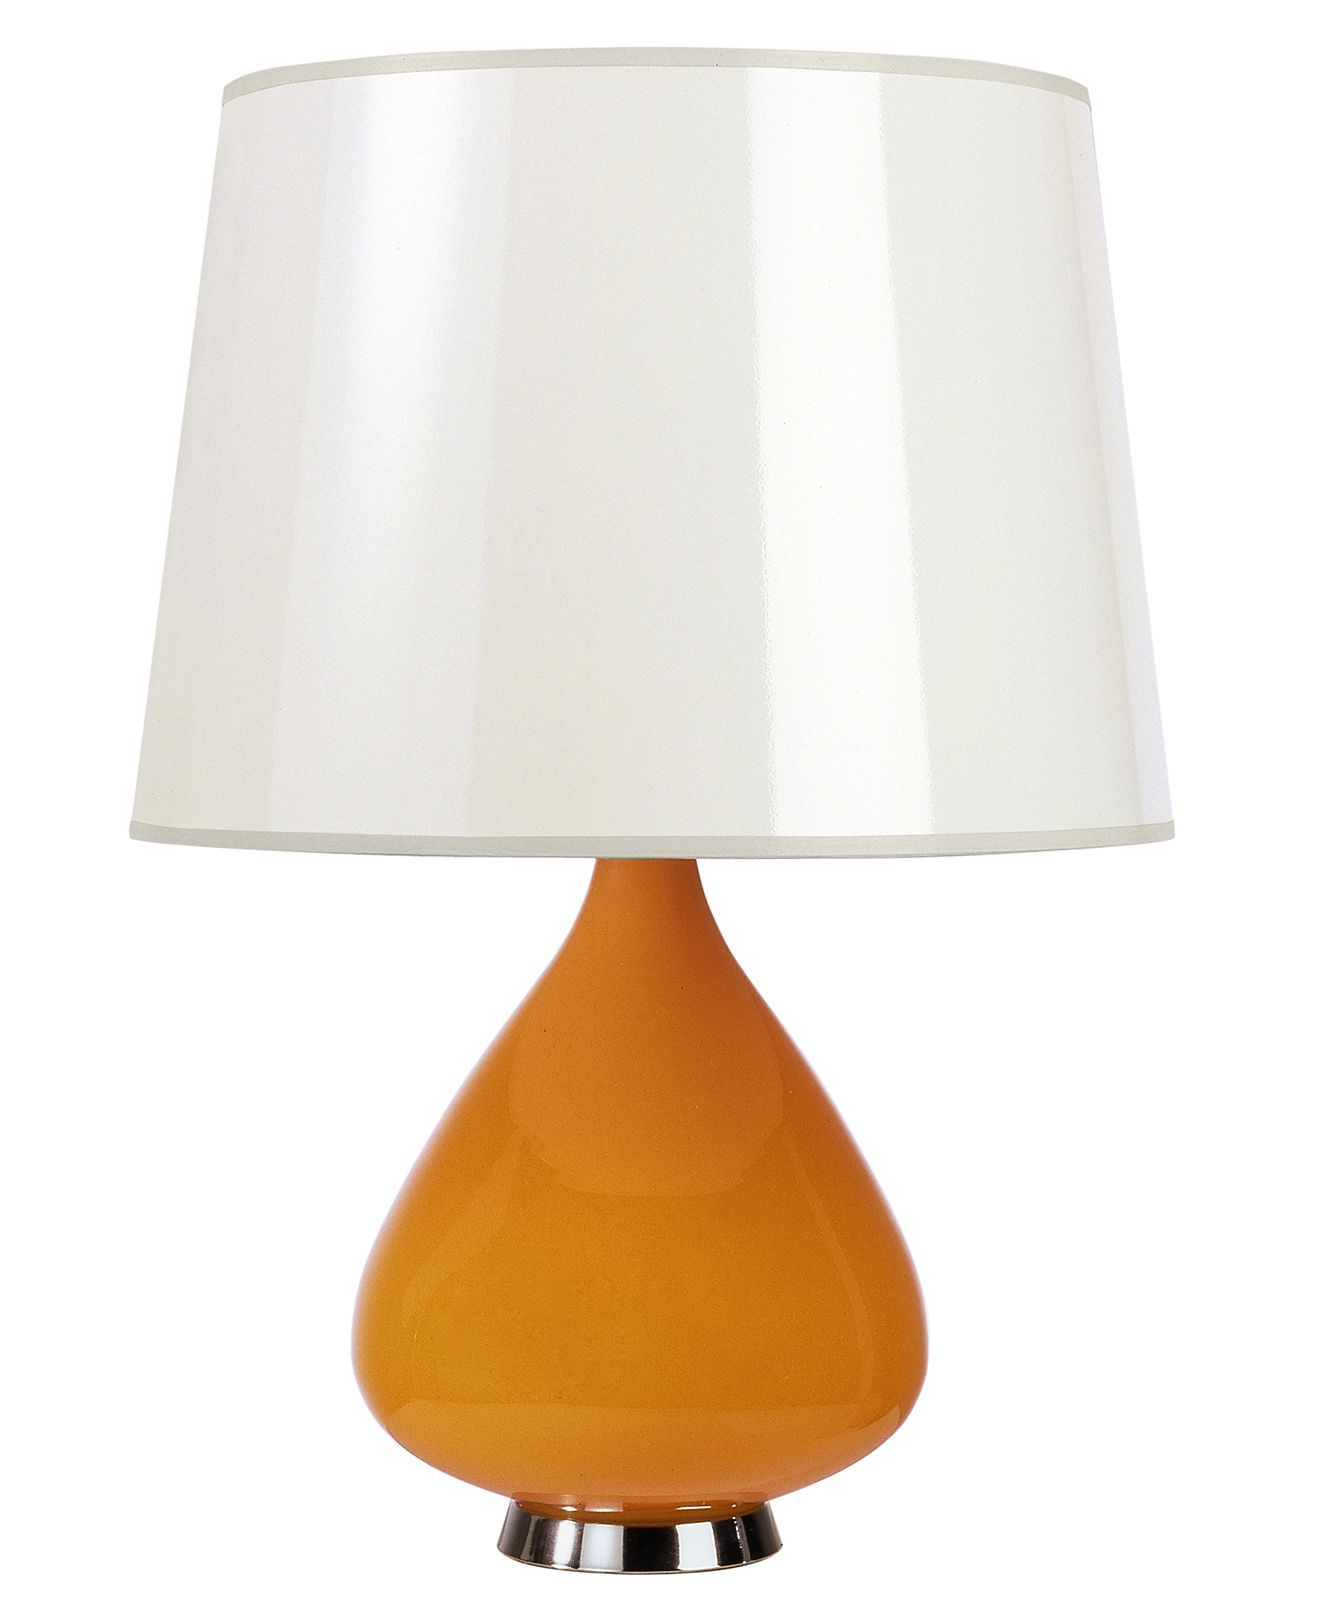 Jonathan Adler Lamp From Macys Com Shop Macys Com